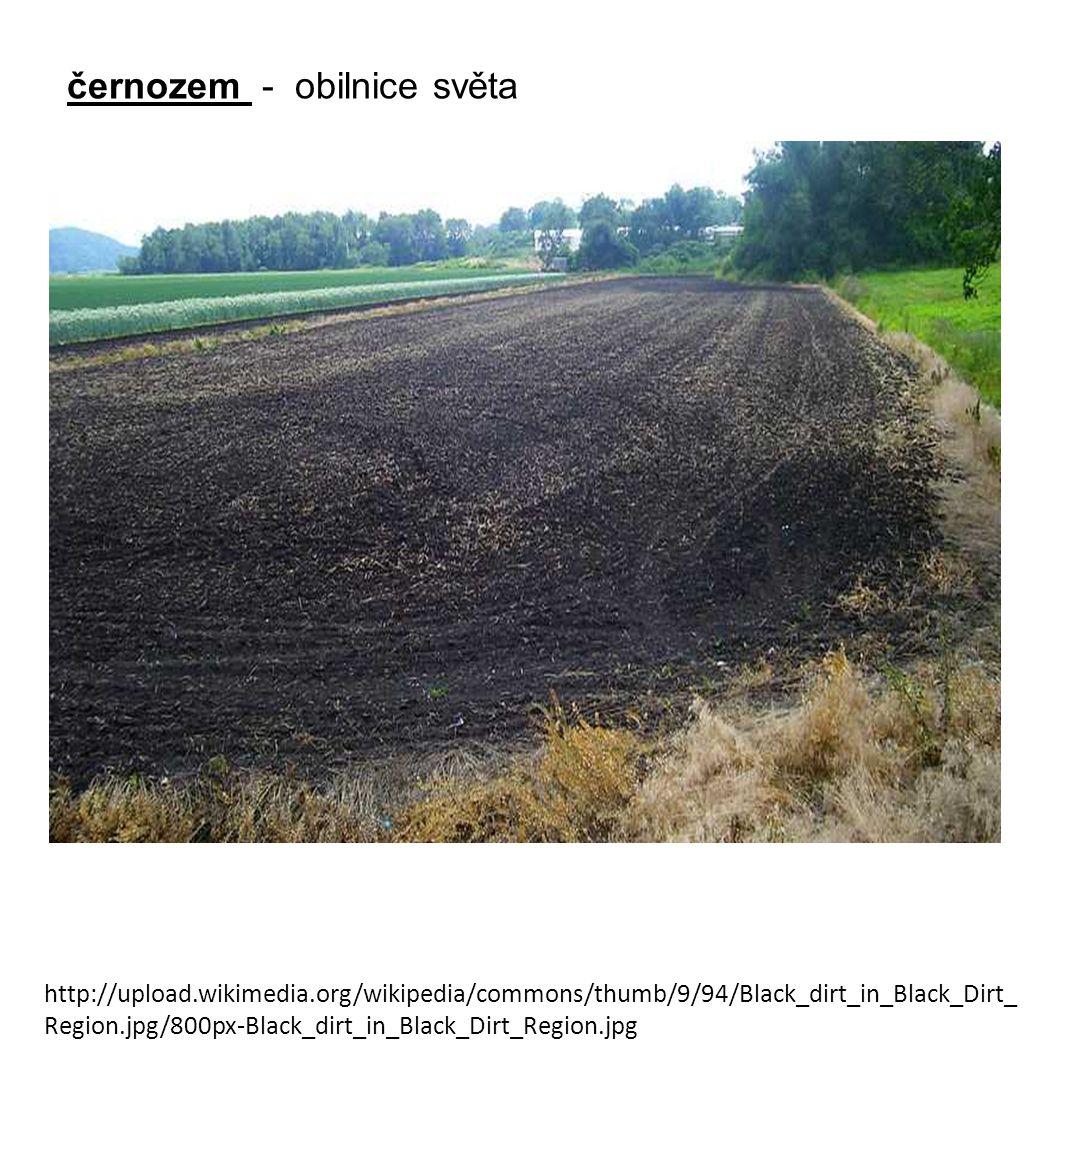 http://www.voderek.cz/prirodopis/ekoprirodopis9/p913/p913_soubory/image002.gif hnědozem horizont A1 - humusový A2 - vyluhovaný B - obohacený C - matečná hornina